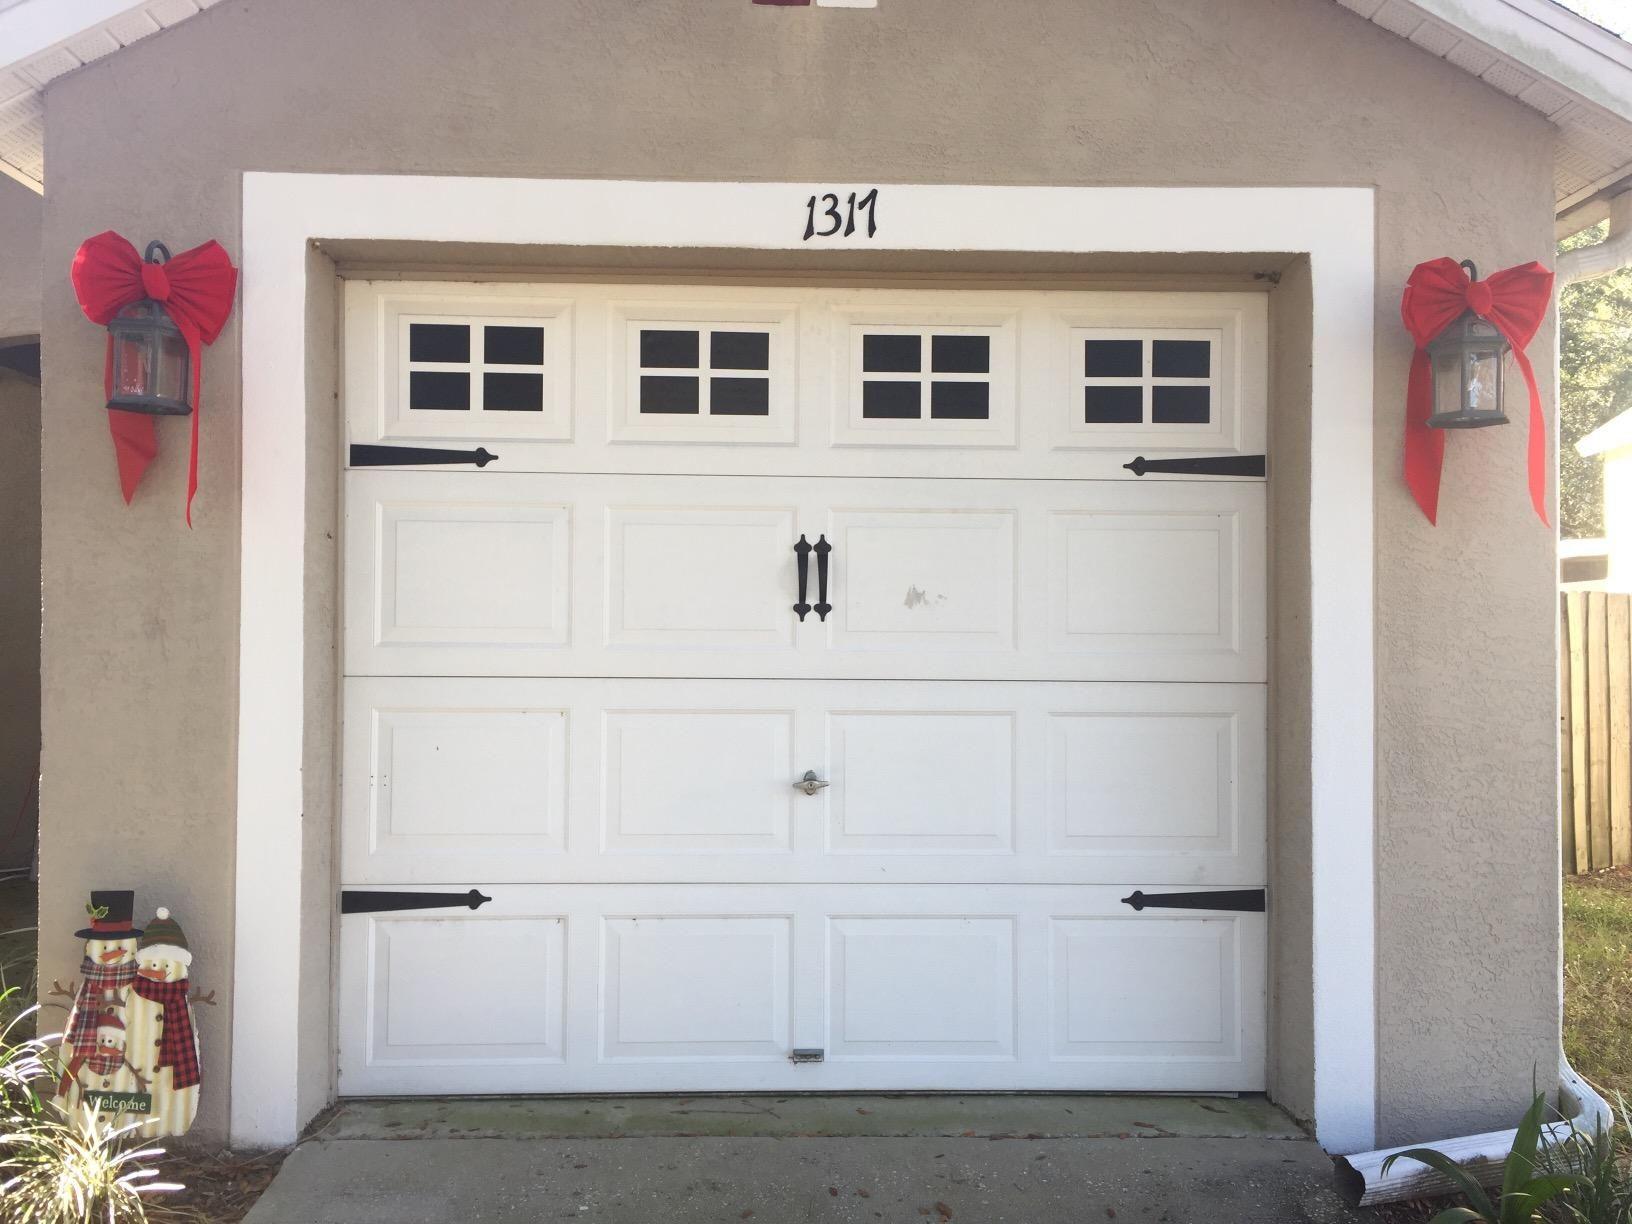 Amazon Com Customer Reviews Decorative Magnetic Garage Door Window Panes Black 2 Car Garage Garage Door Windows Garage Doors Windows And Doors